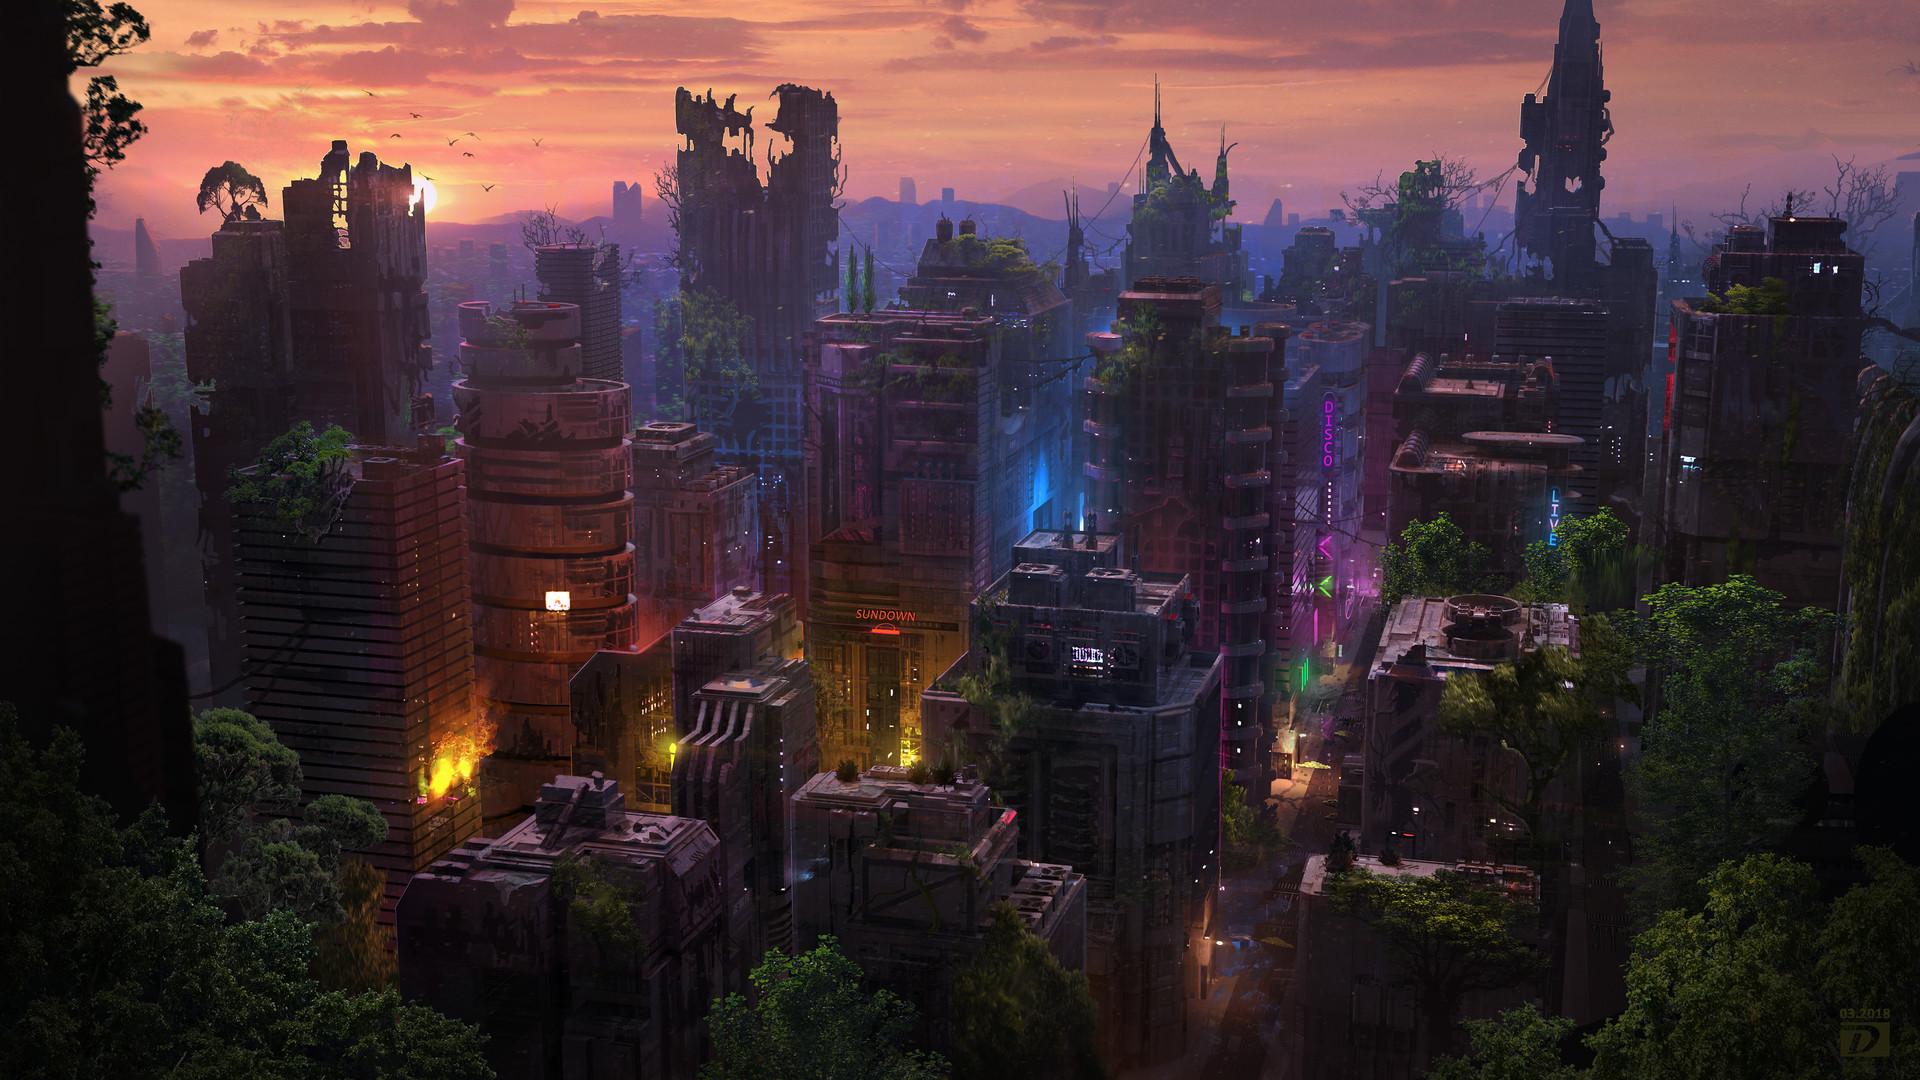 General 1920x1080 digital art city futuristic fantasy art building sunset science fiction ruins